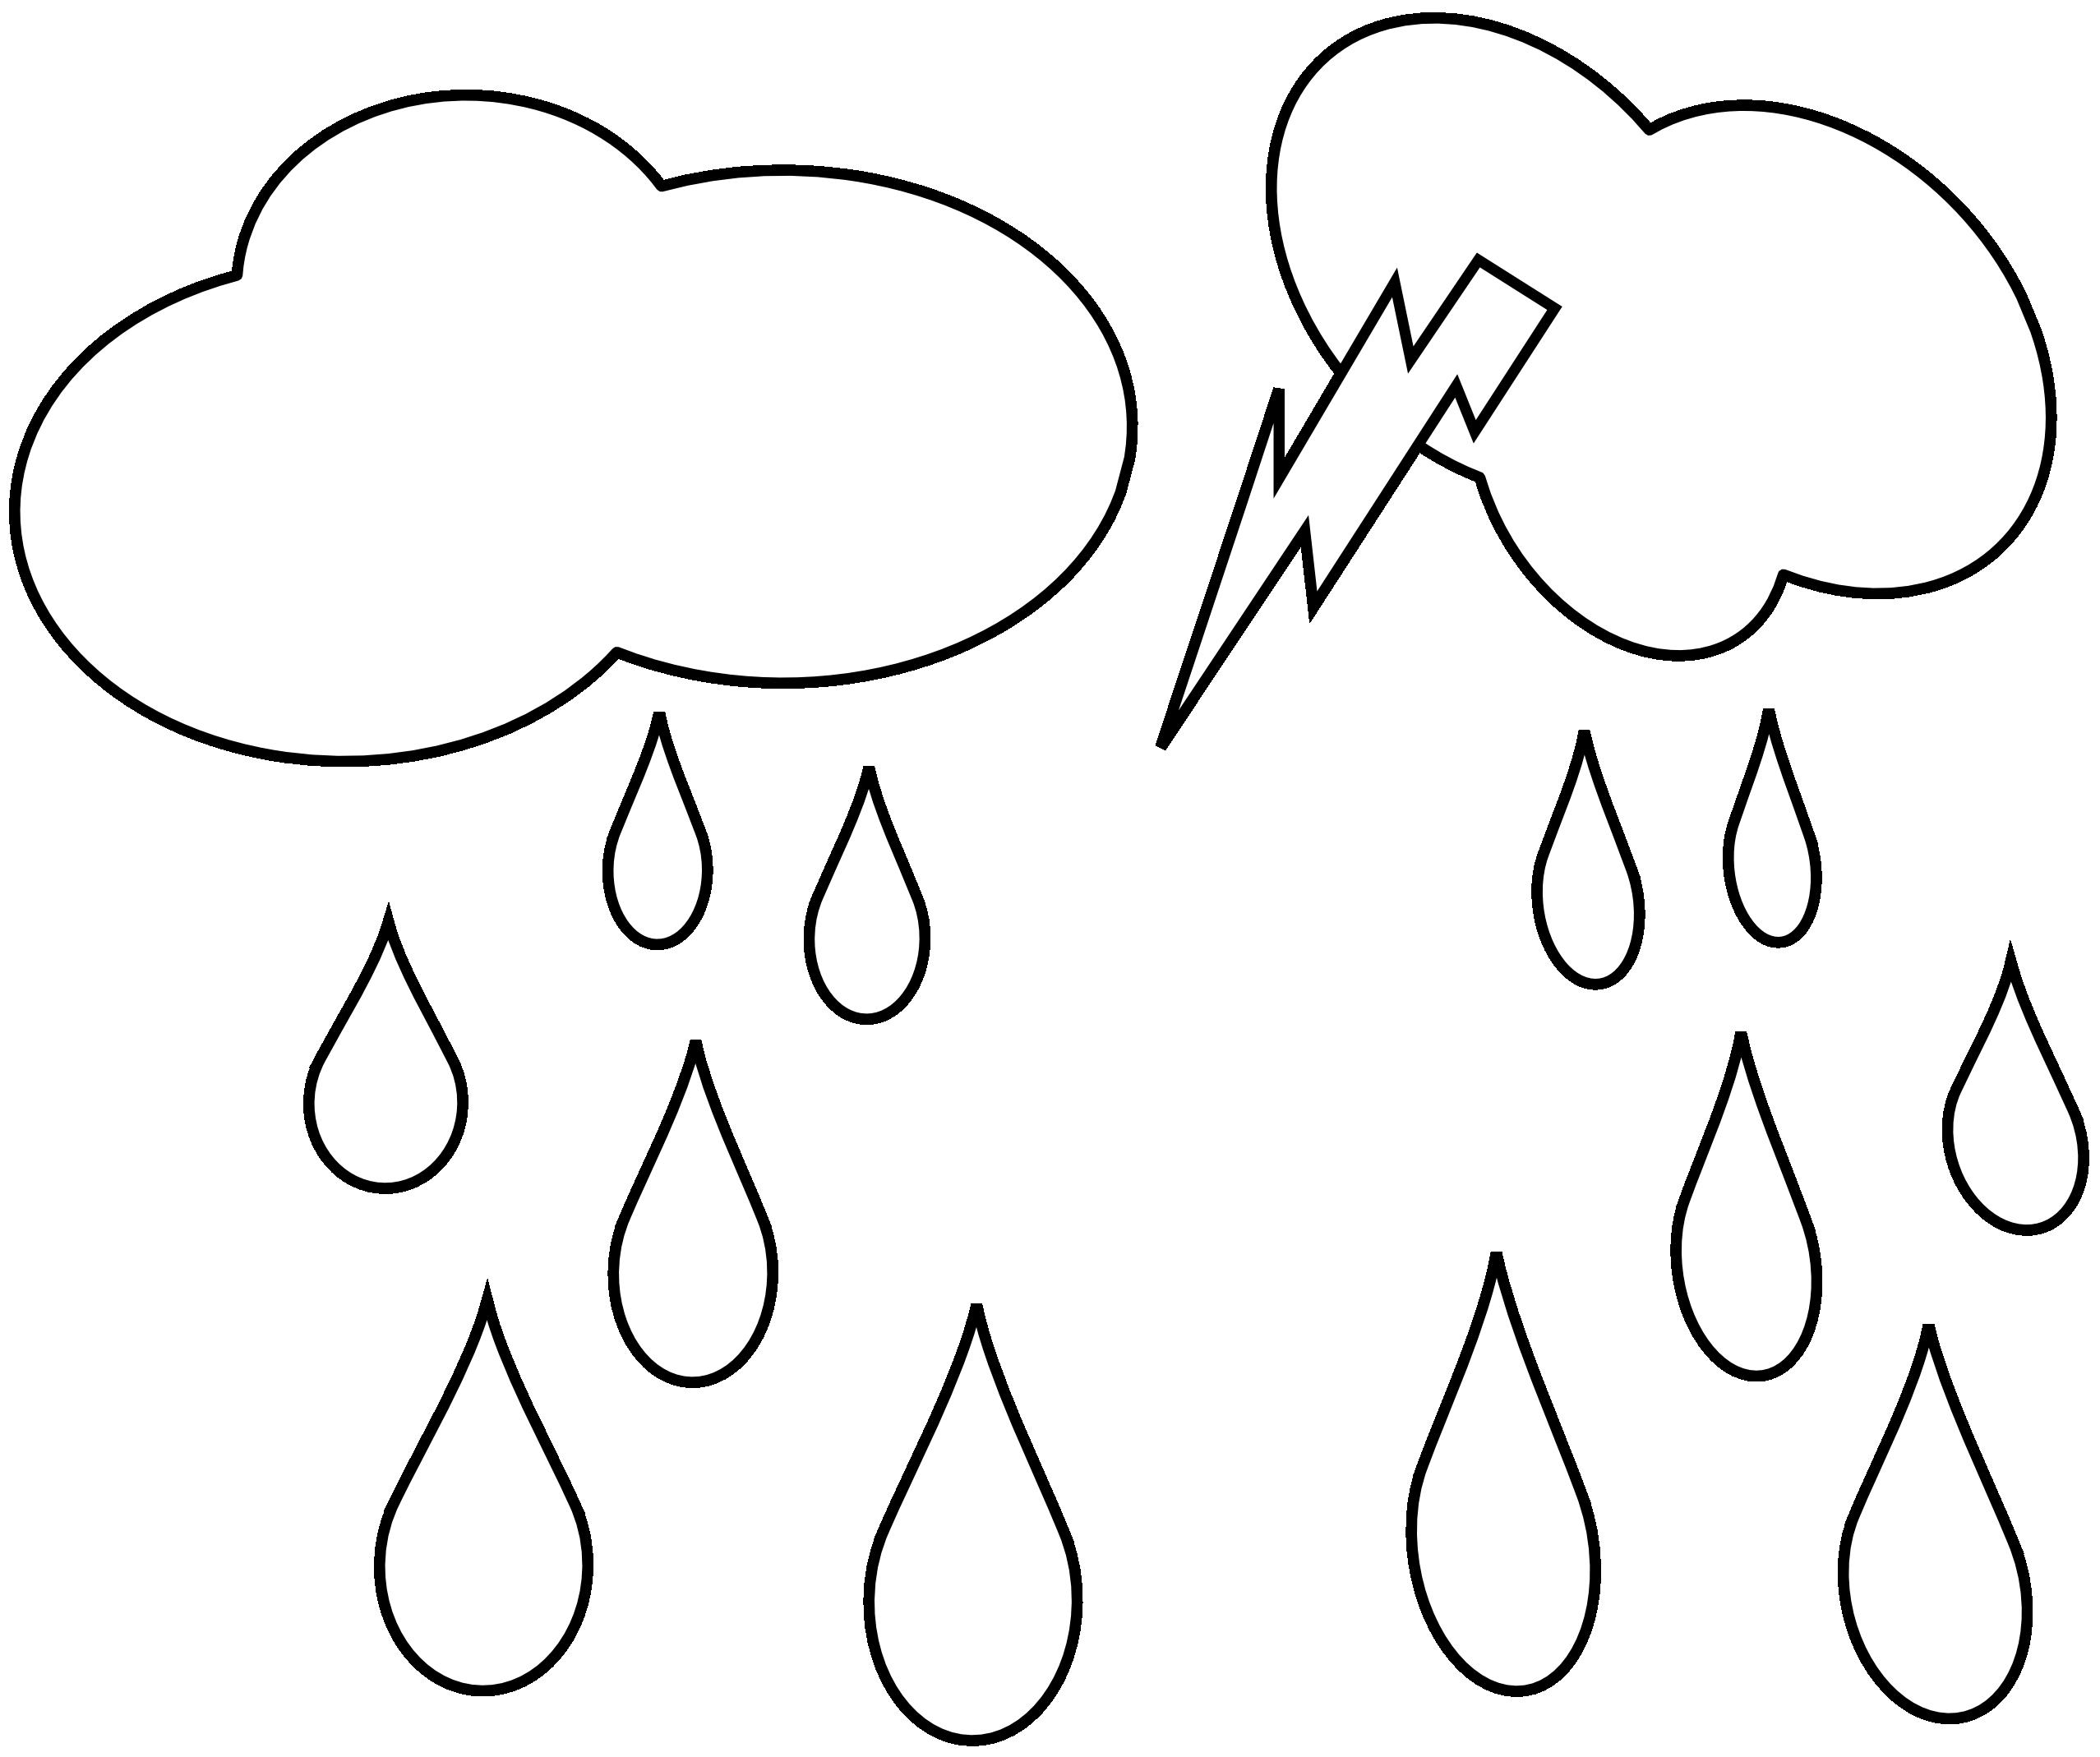 Lightening clipart rain cloud Black Panda rain%20clouds%20clipart%20black%20and%20white White